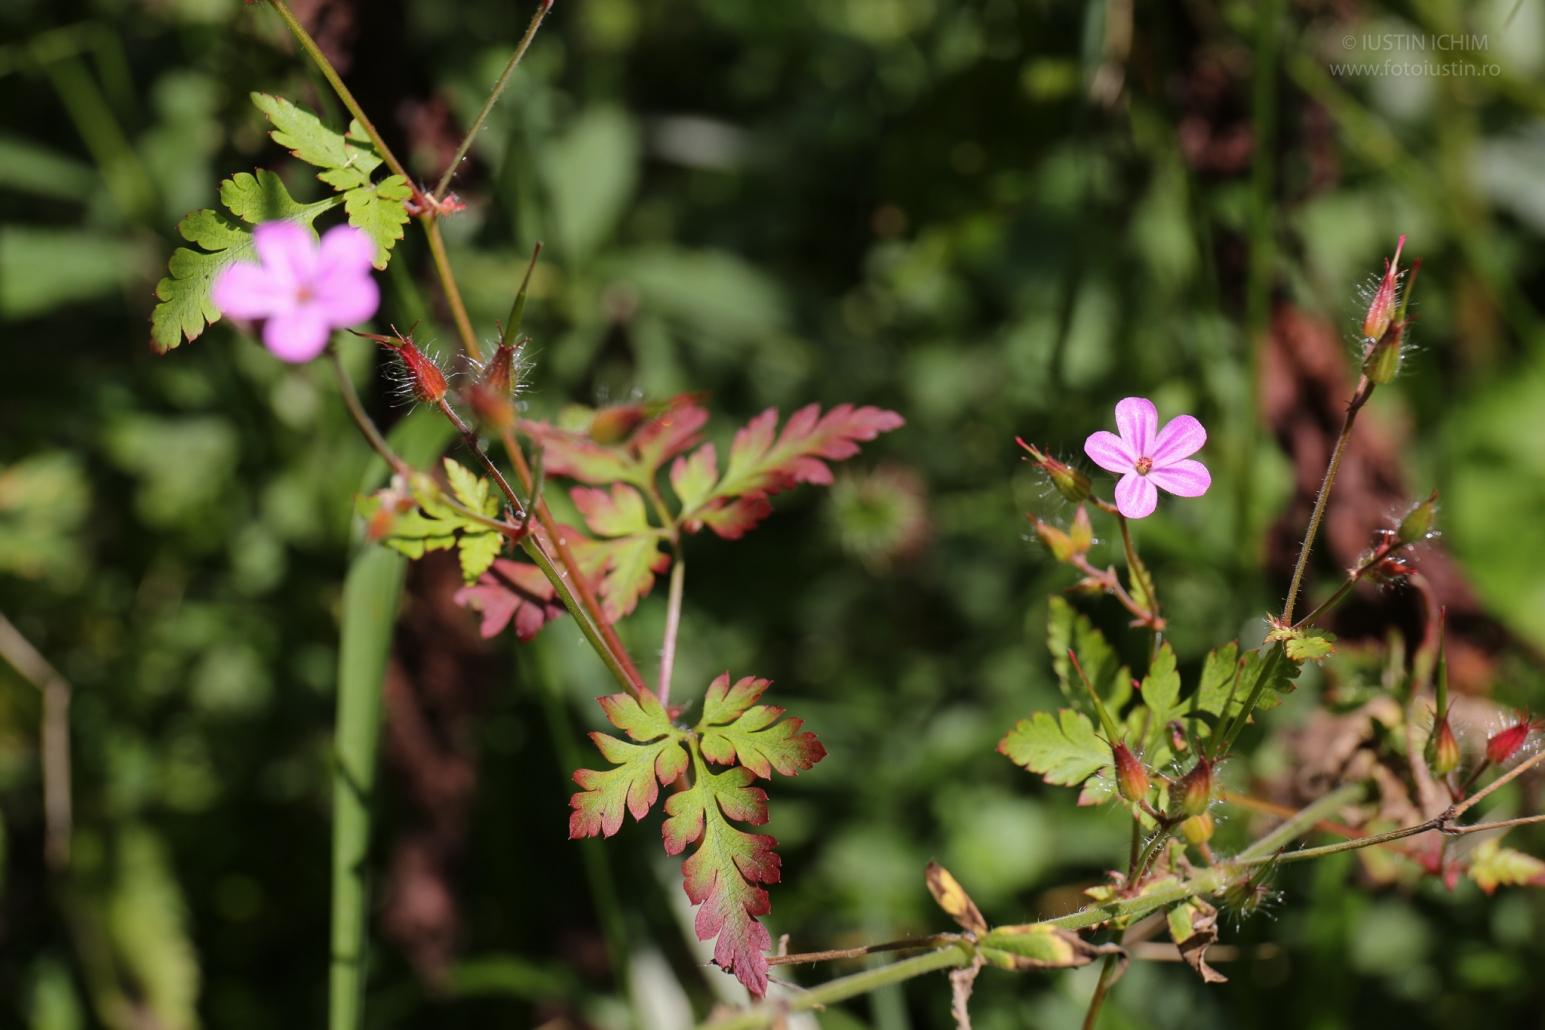 Geranium robertianum, Năprasnic